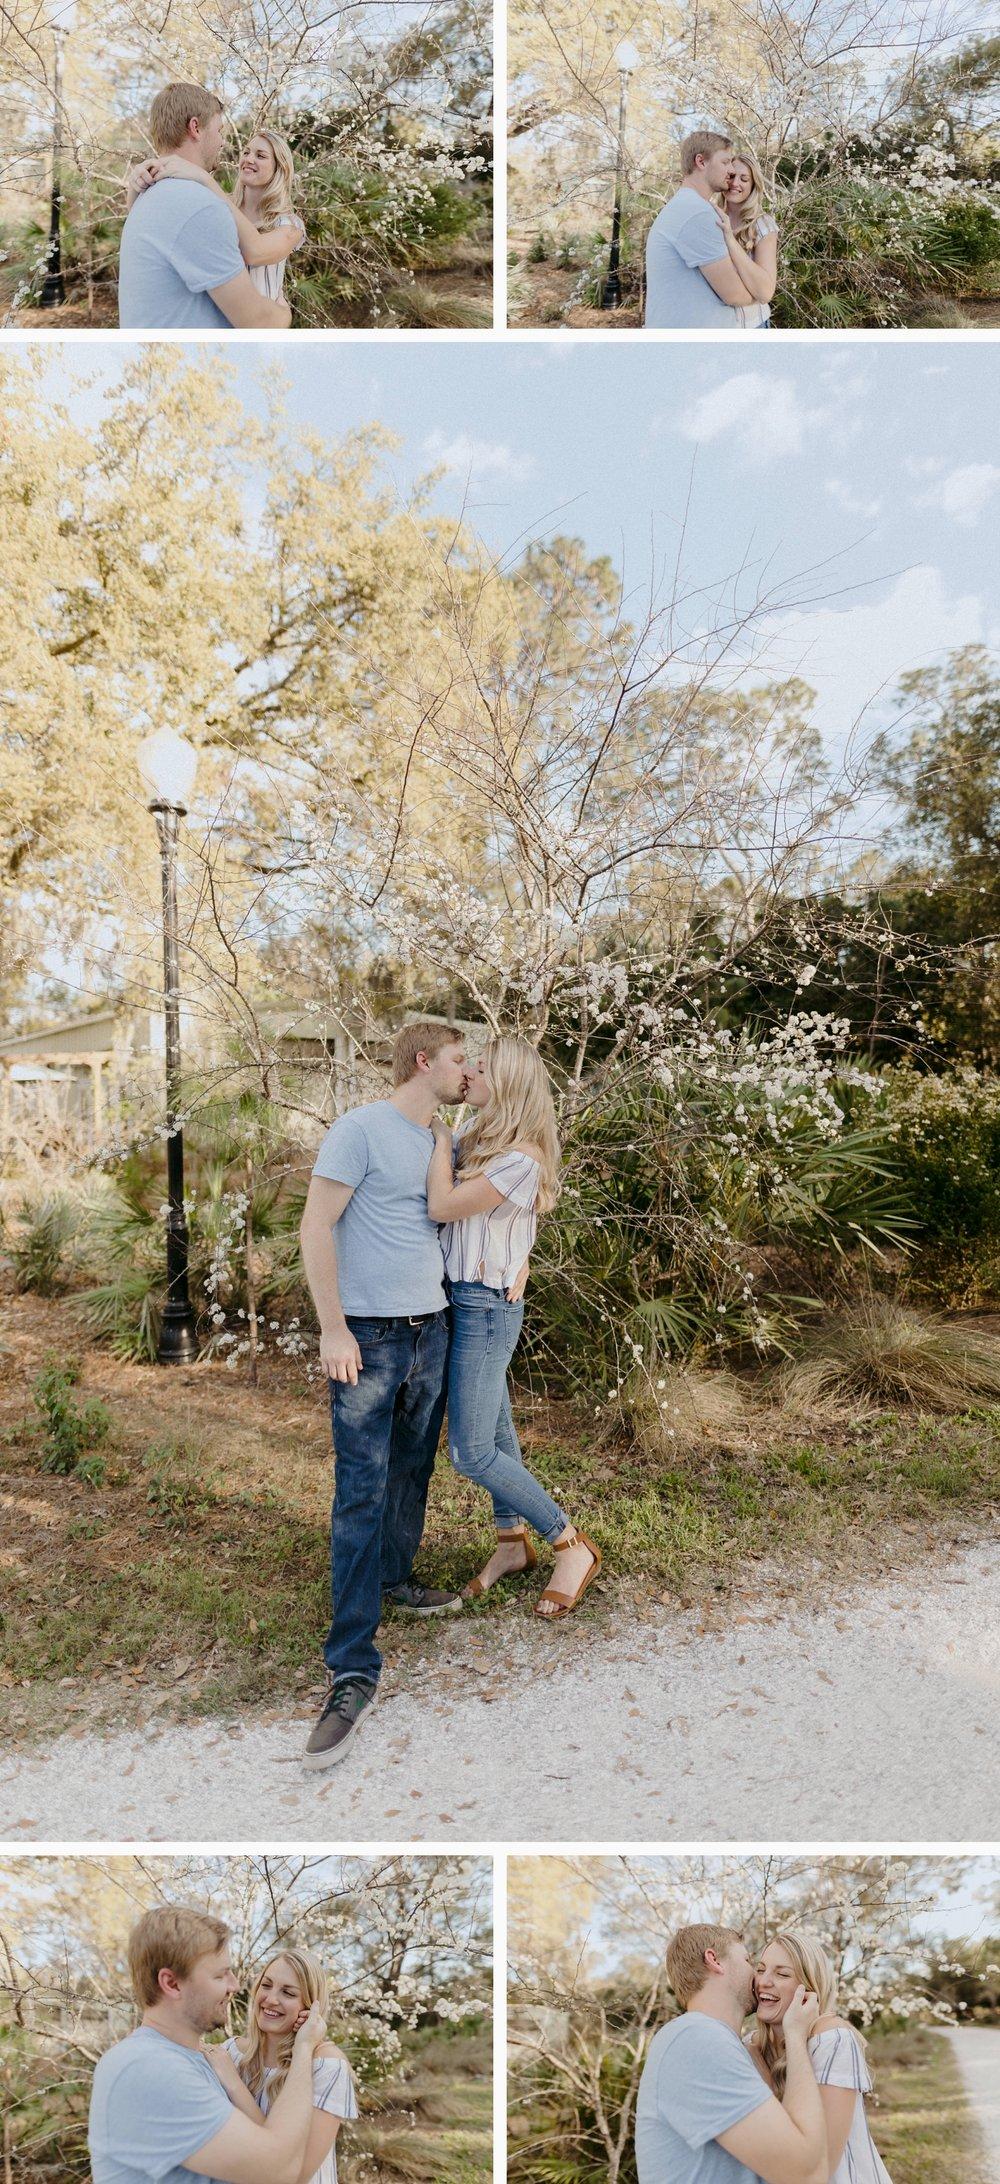 Kylie-And-Jack-Mead-Botanical-Garden-Engagement_0026.jpg